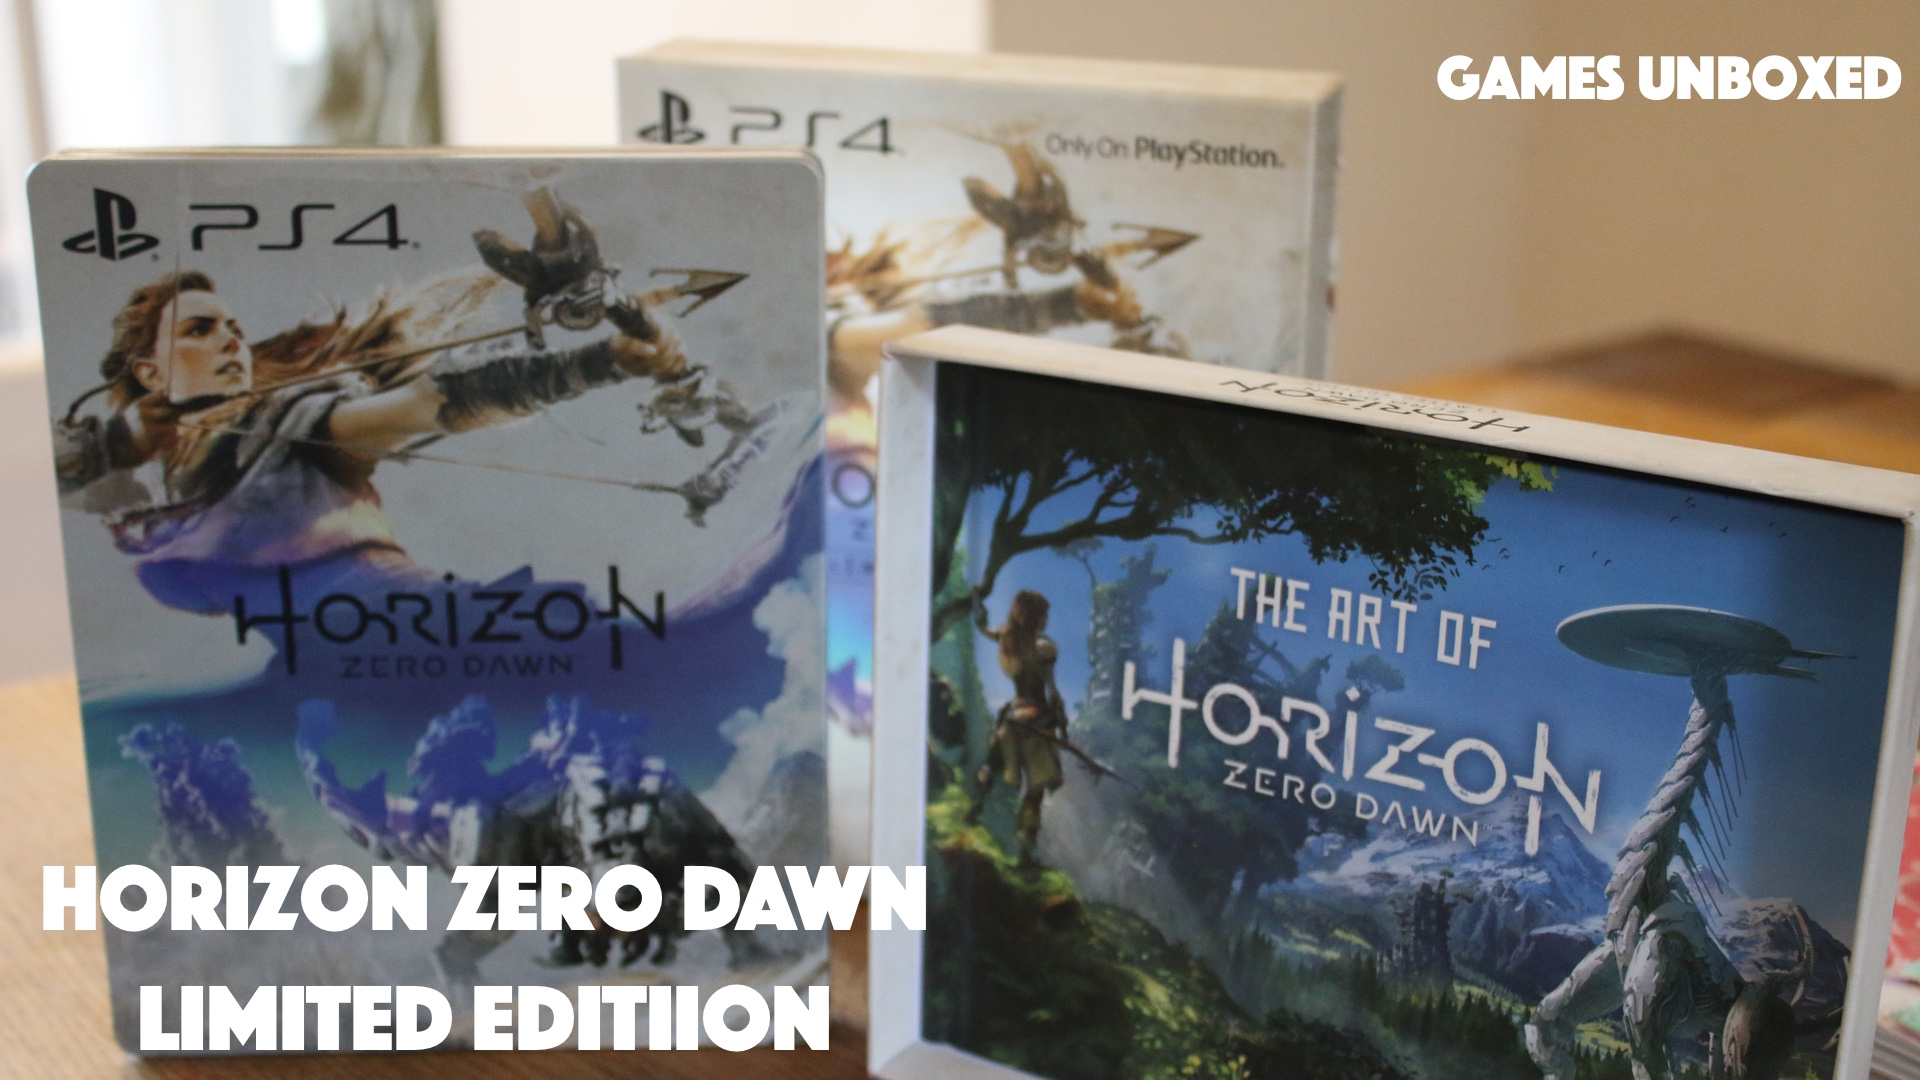 Horizon Zero Dawn Limited Edition | Games Unboxed